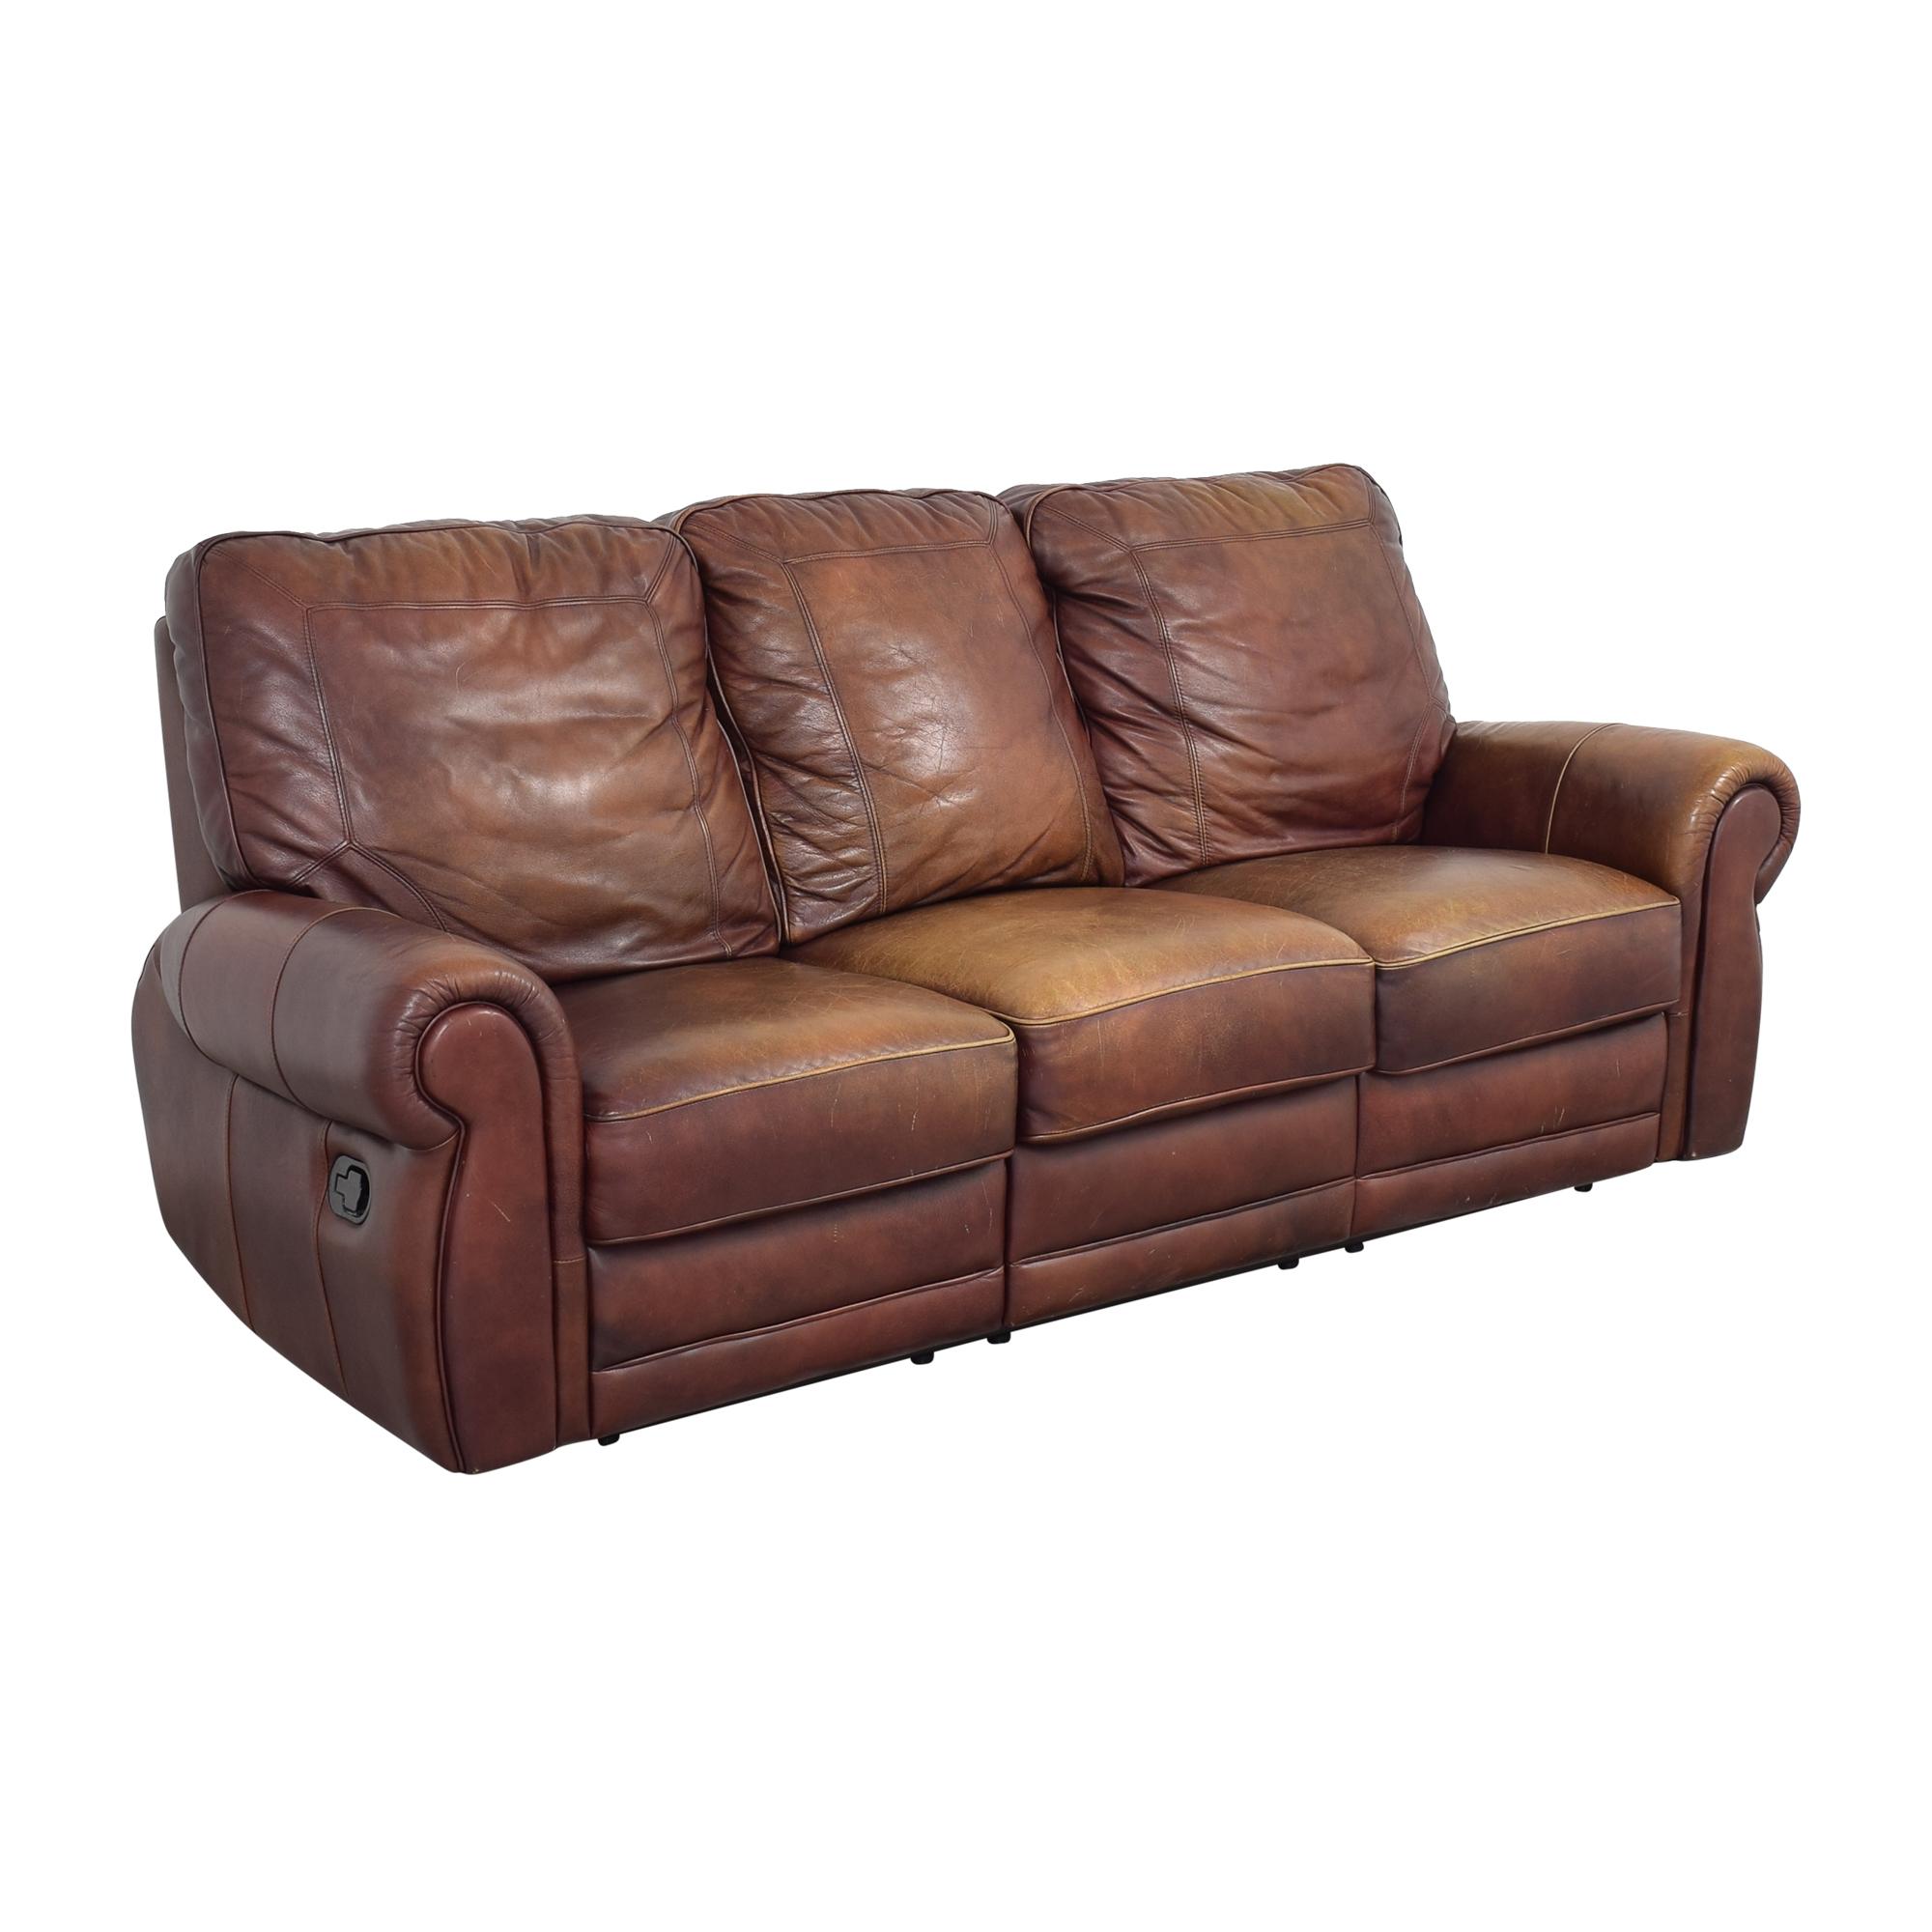 Three Cushion Reclining Sofa on sale